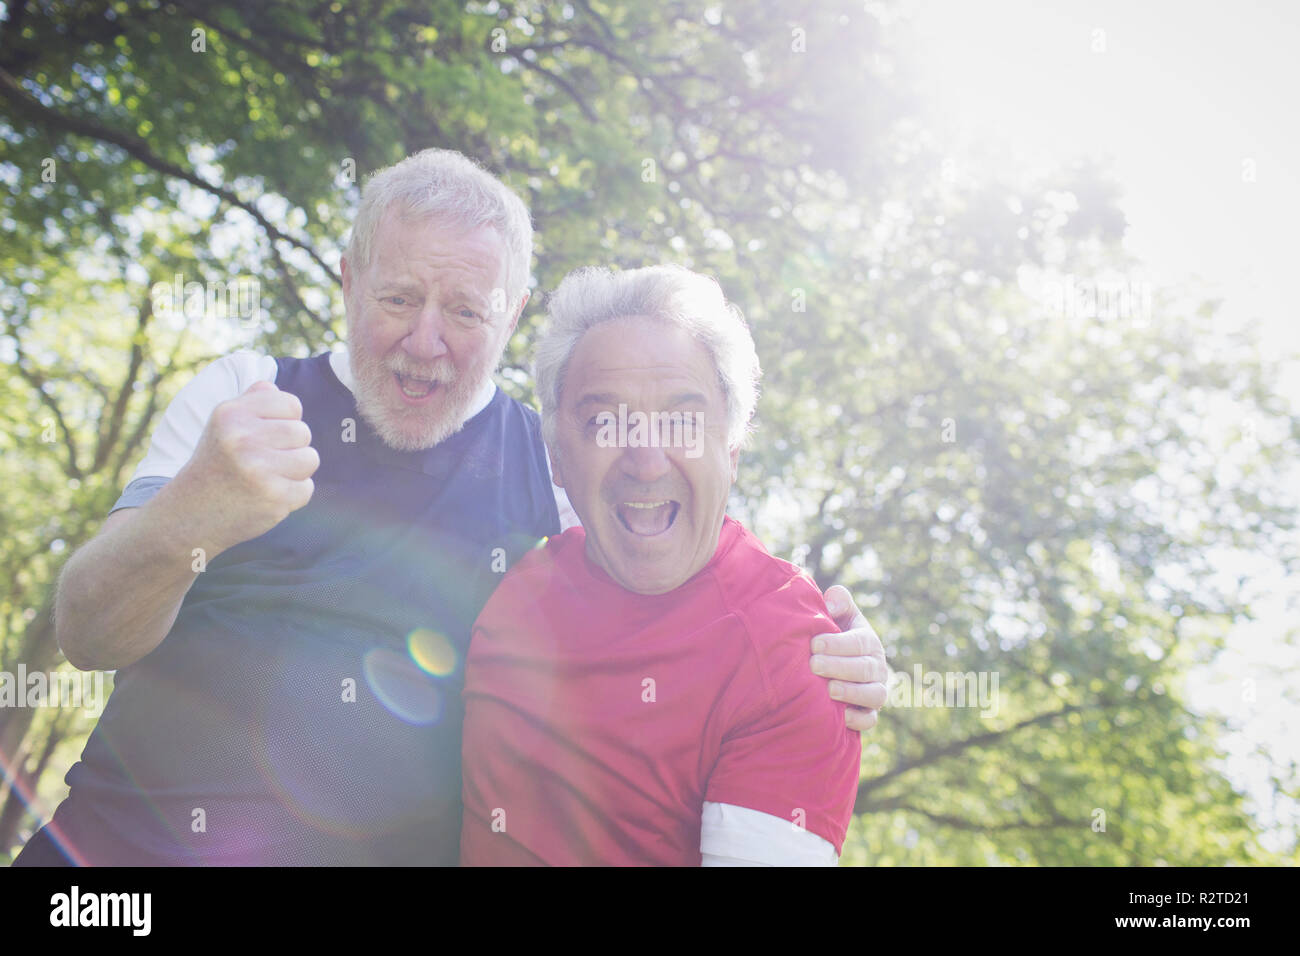 Retrato exuberante active altos hombres vítores en sunny park Imagen De Stock